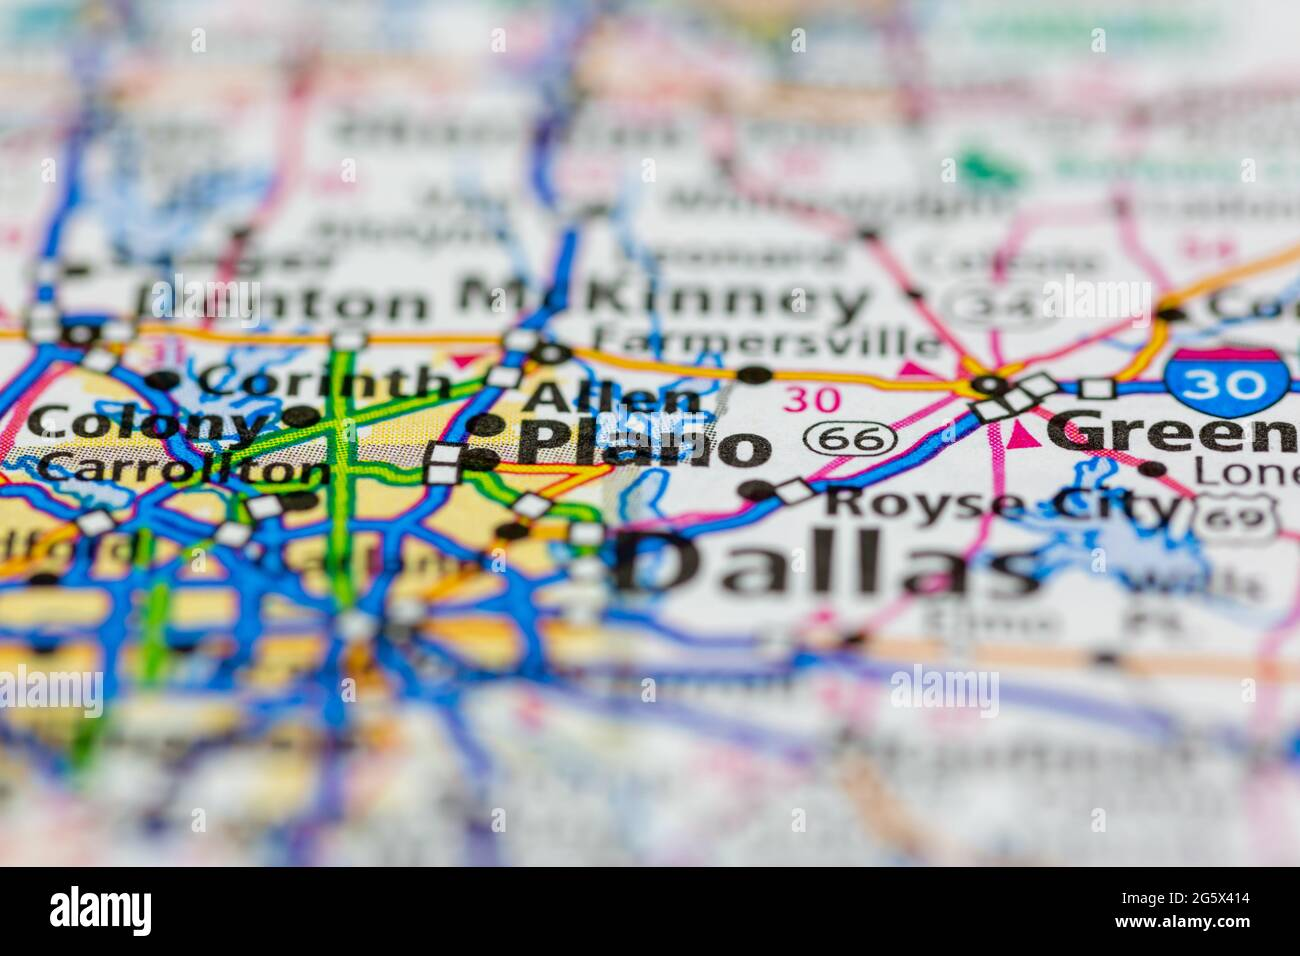 Plano Texas USA mostrado en un mapa geográfico o mapa de carreteras Foto de stock